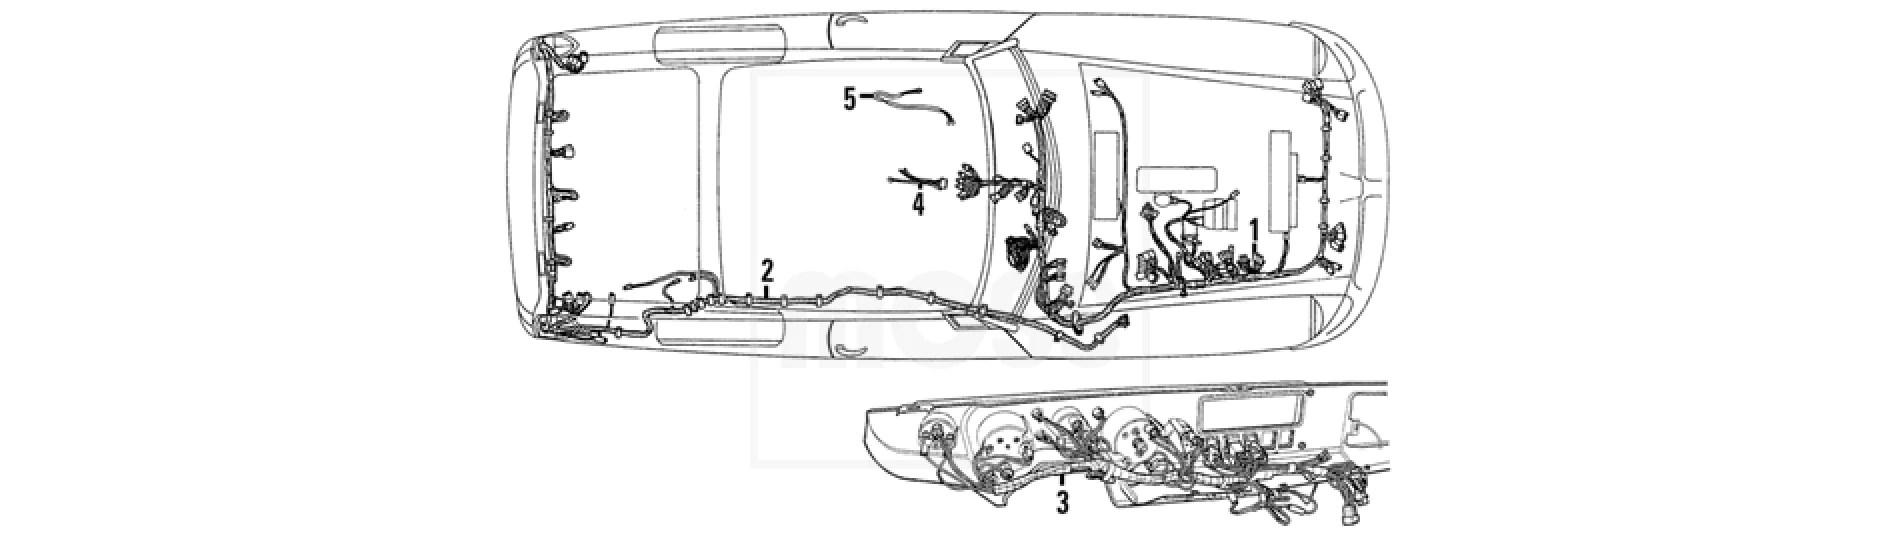 hight resolution of  mgb wiring harness wiring diagram expert on 1976 midget wiring diagram 1976 triumph